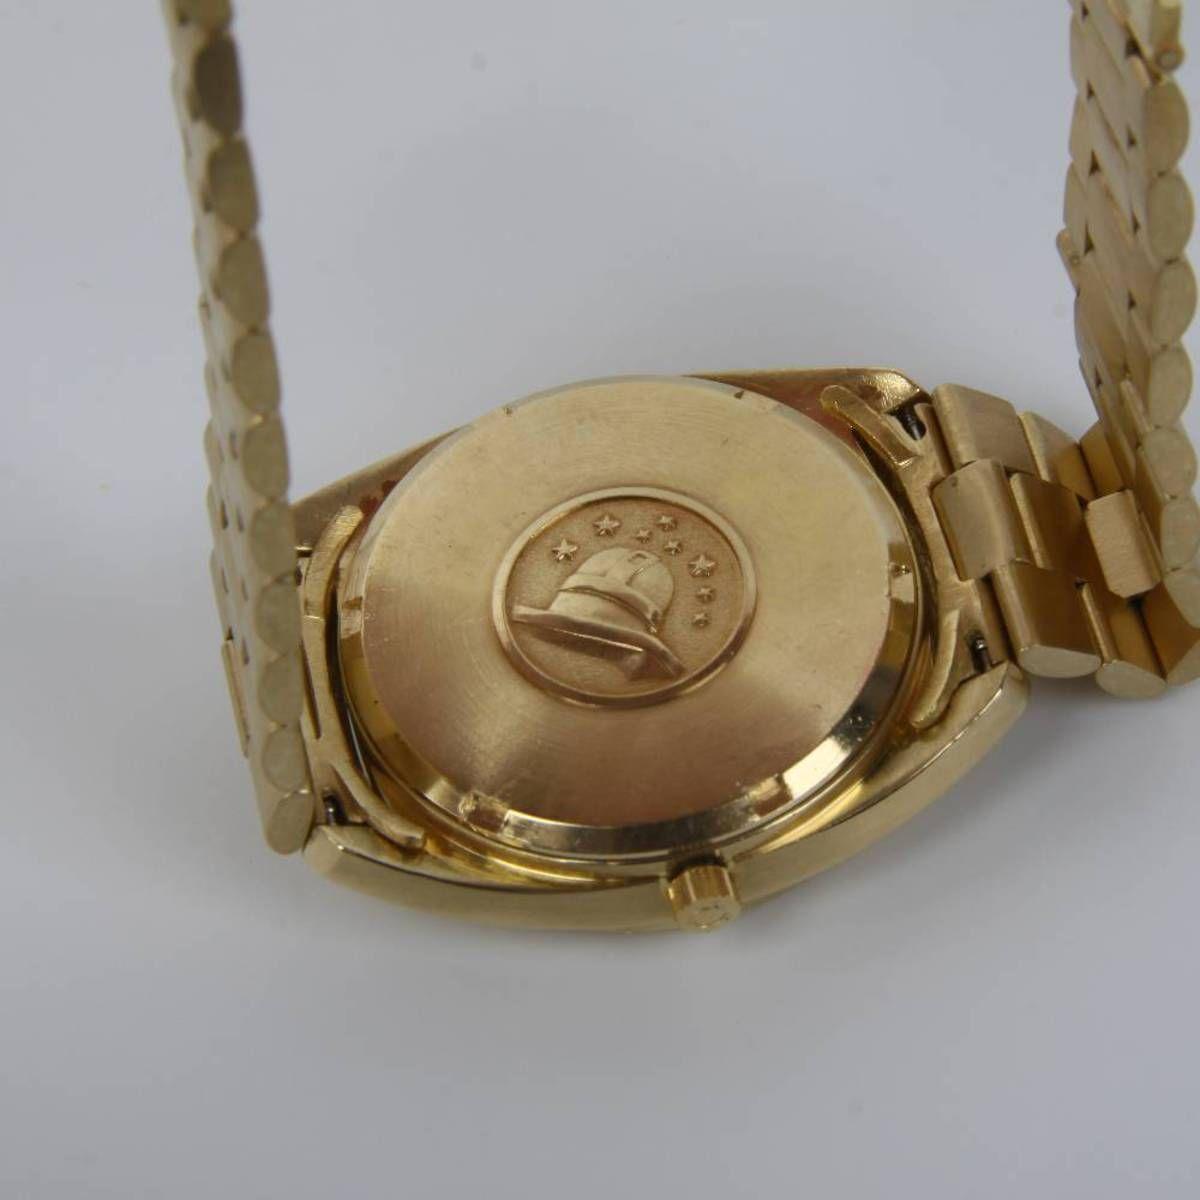 d656f100d3c0 Reloj OMEGA CONSTELLATION de oro de segunda mano E271884